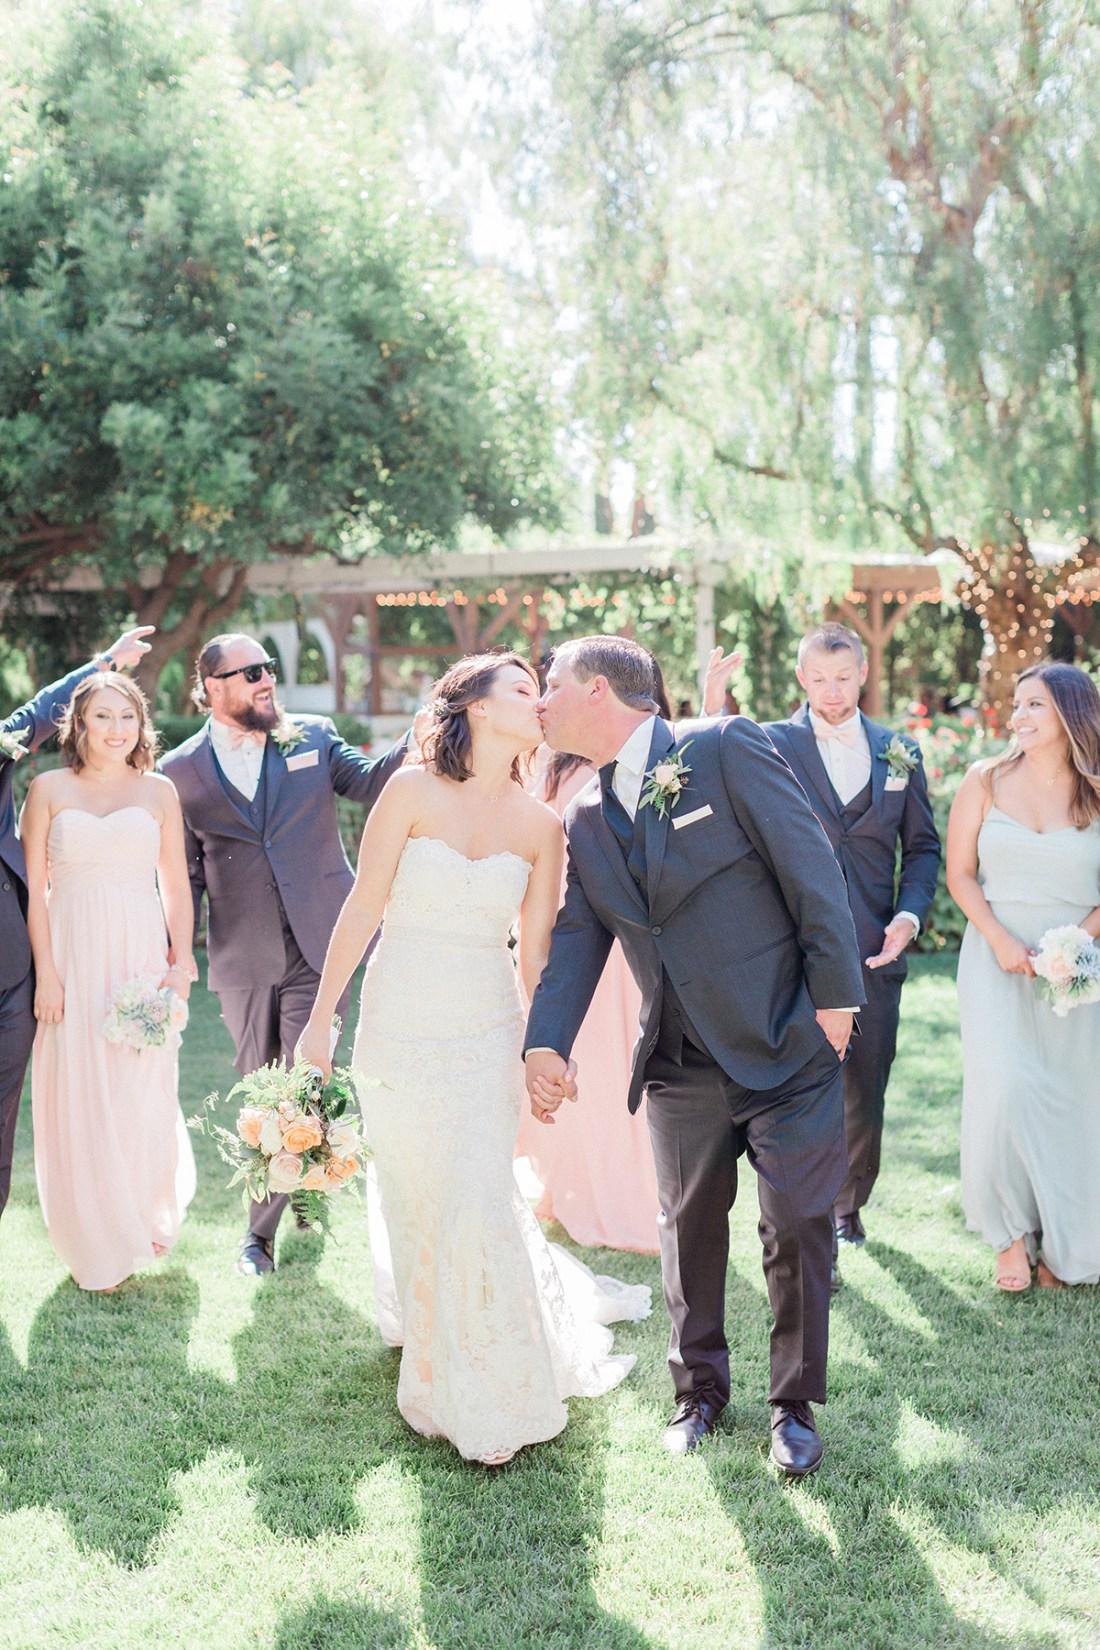 Amanda & Steve's Summer Wedding at Abbott Manor in Temecula, Calf.   A Good Hue